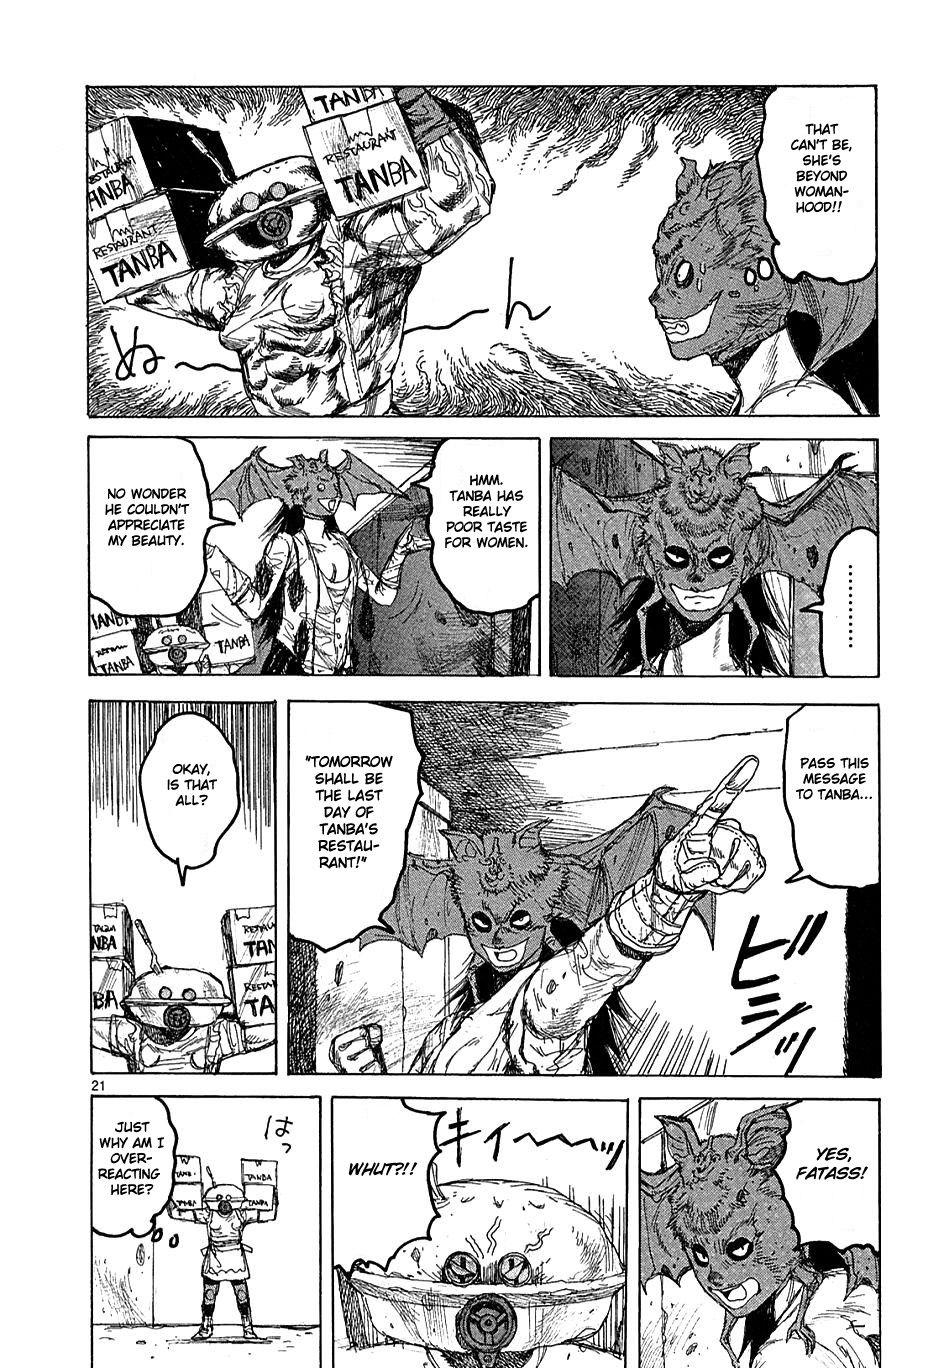 Read manga Dorohedoro 037 online in high quality (mit Bildern)